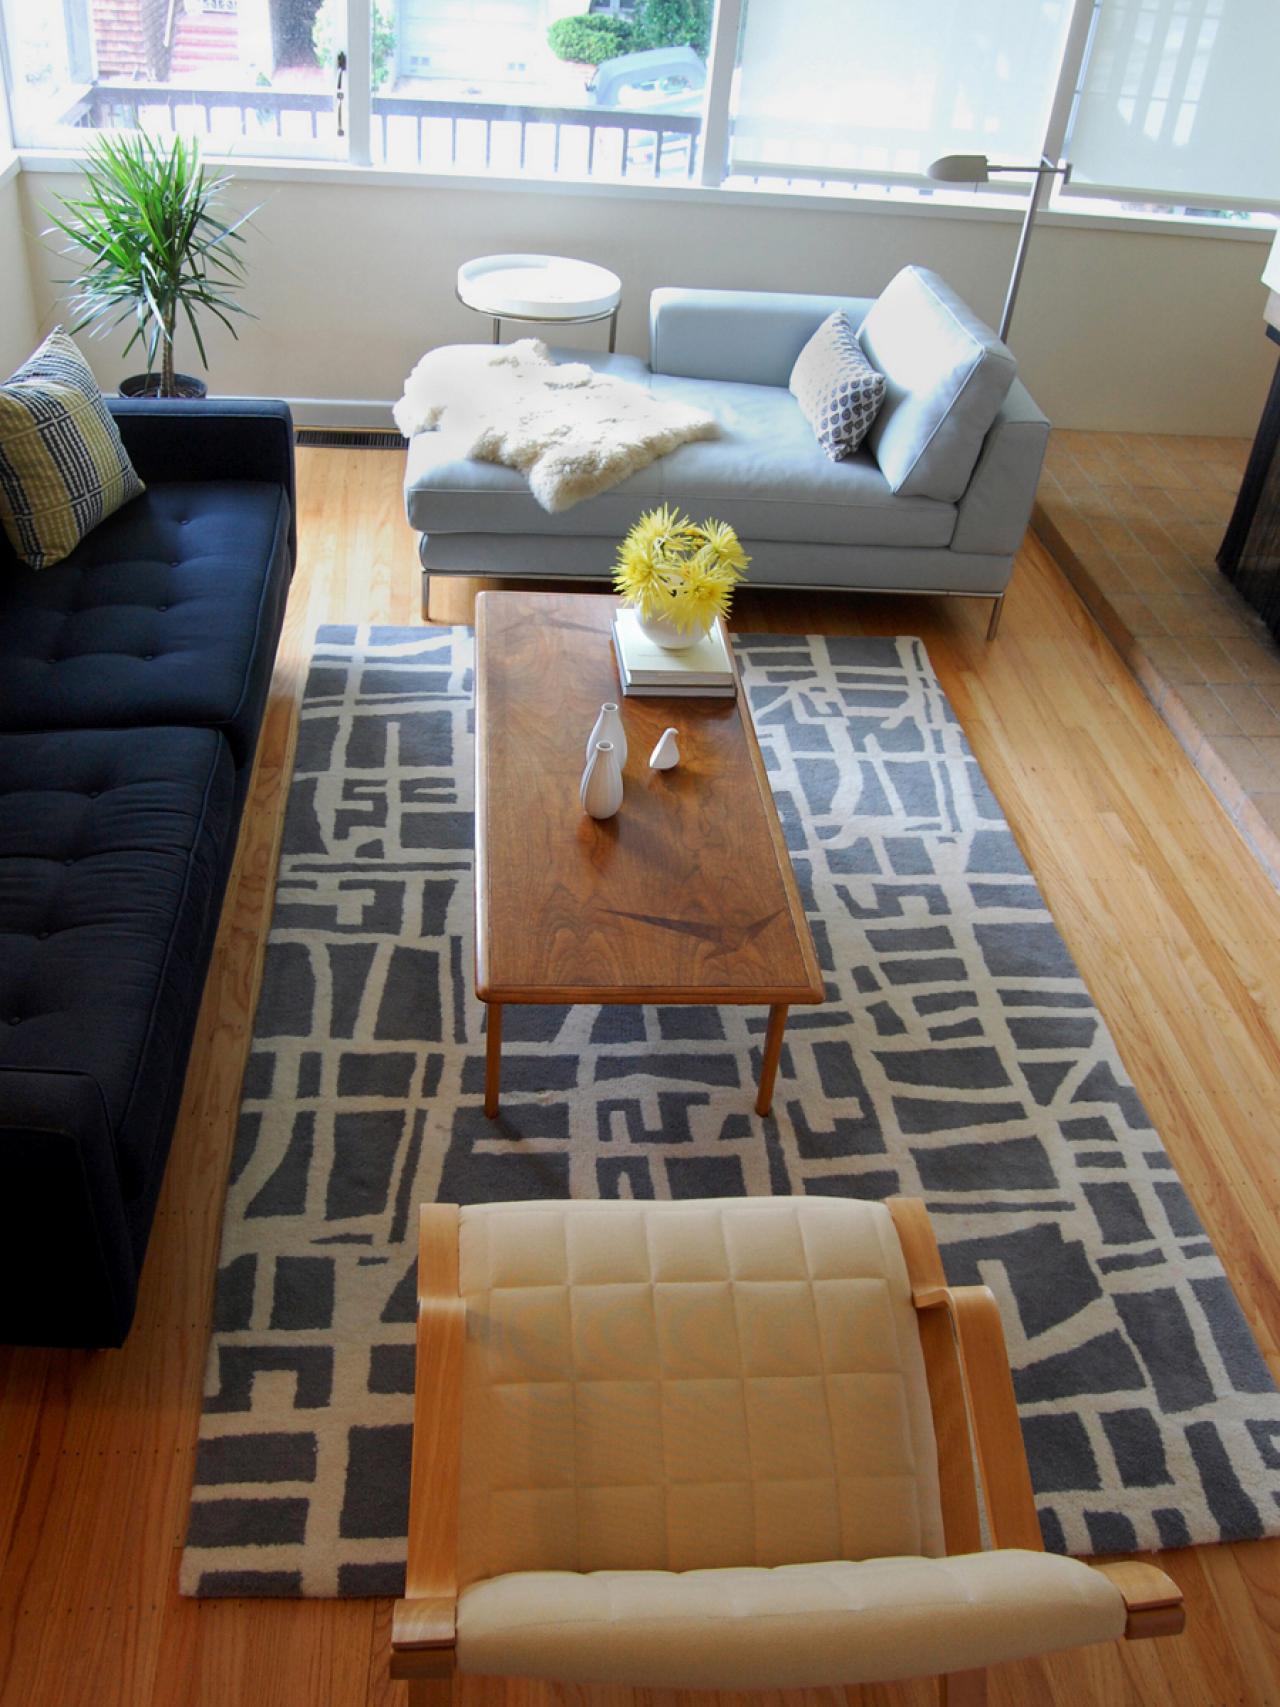 7 Low Budget Living Room Updates Hgtv 39 S Decorating Design Blog Hgtv